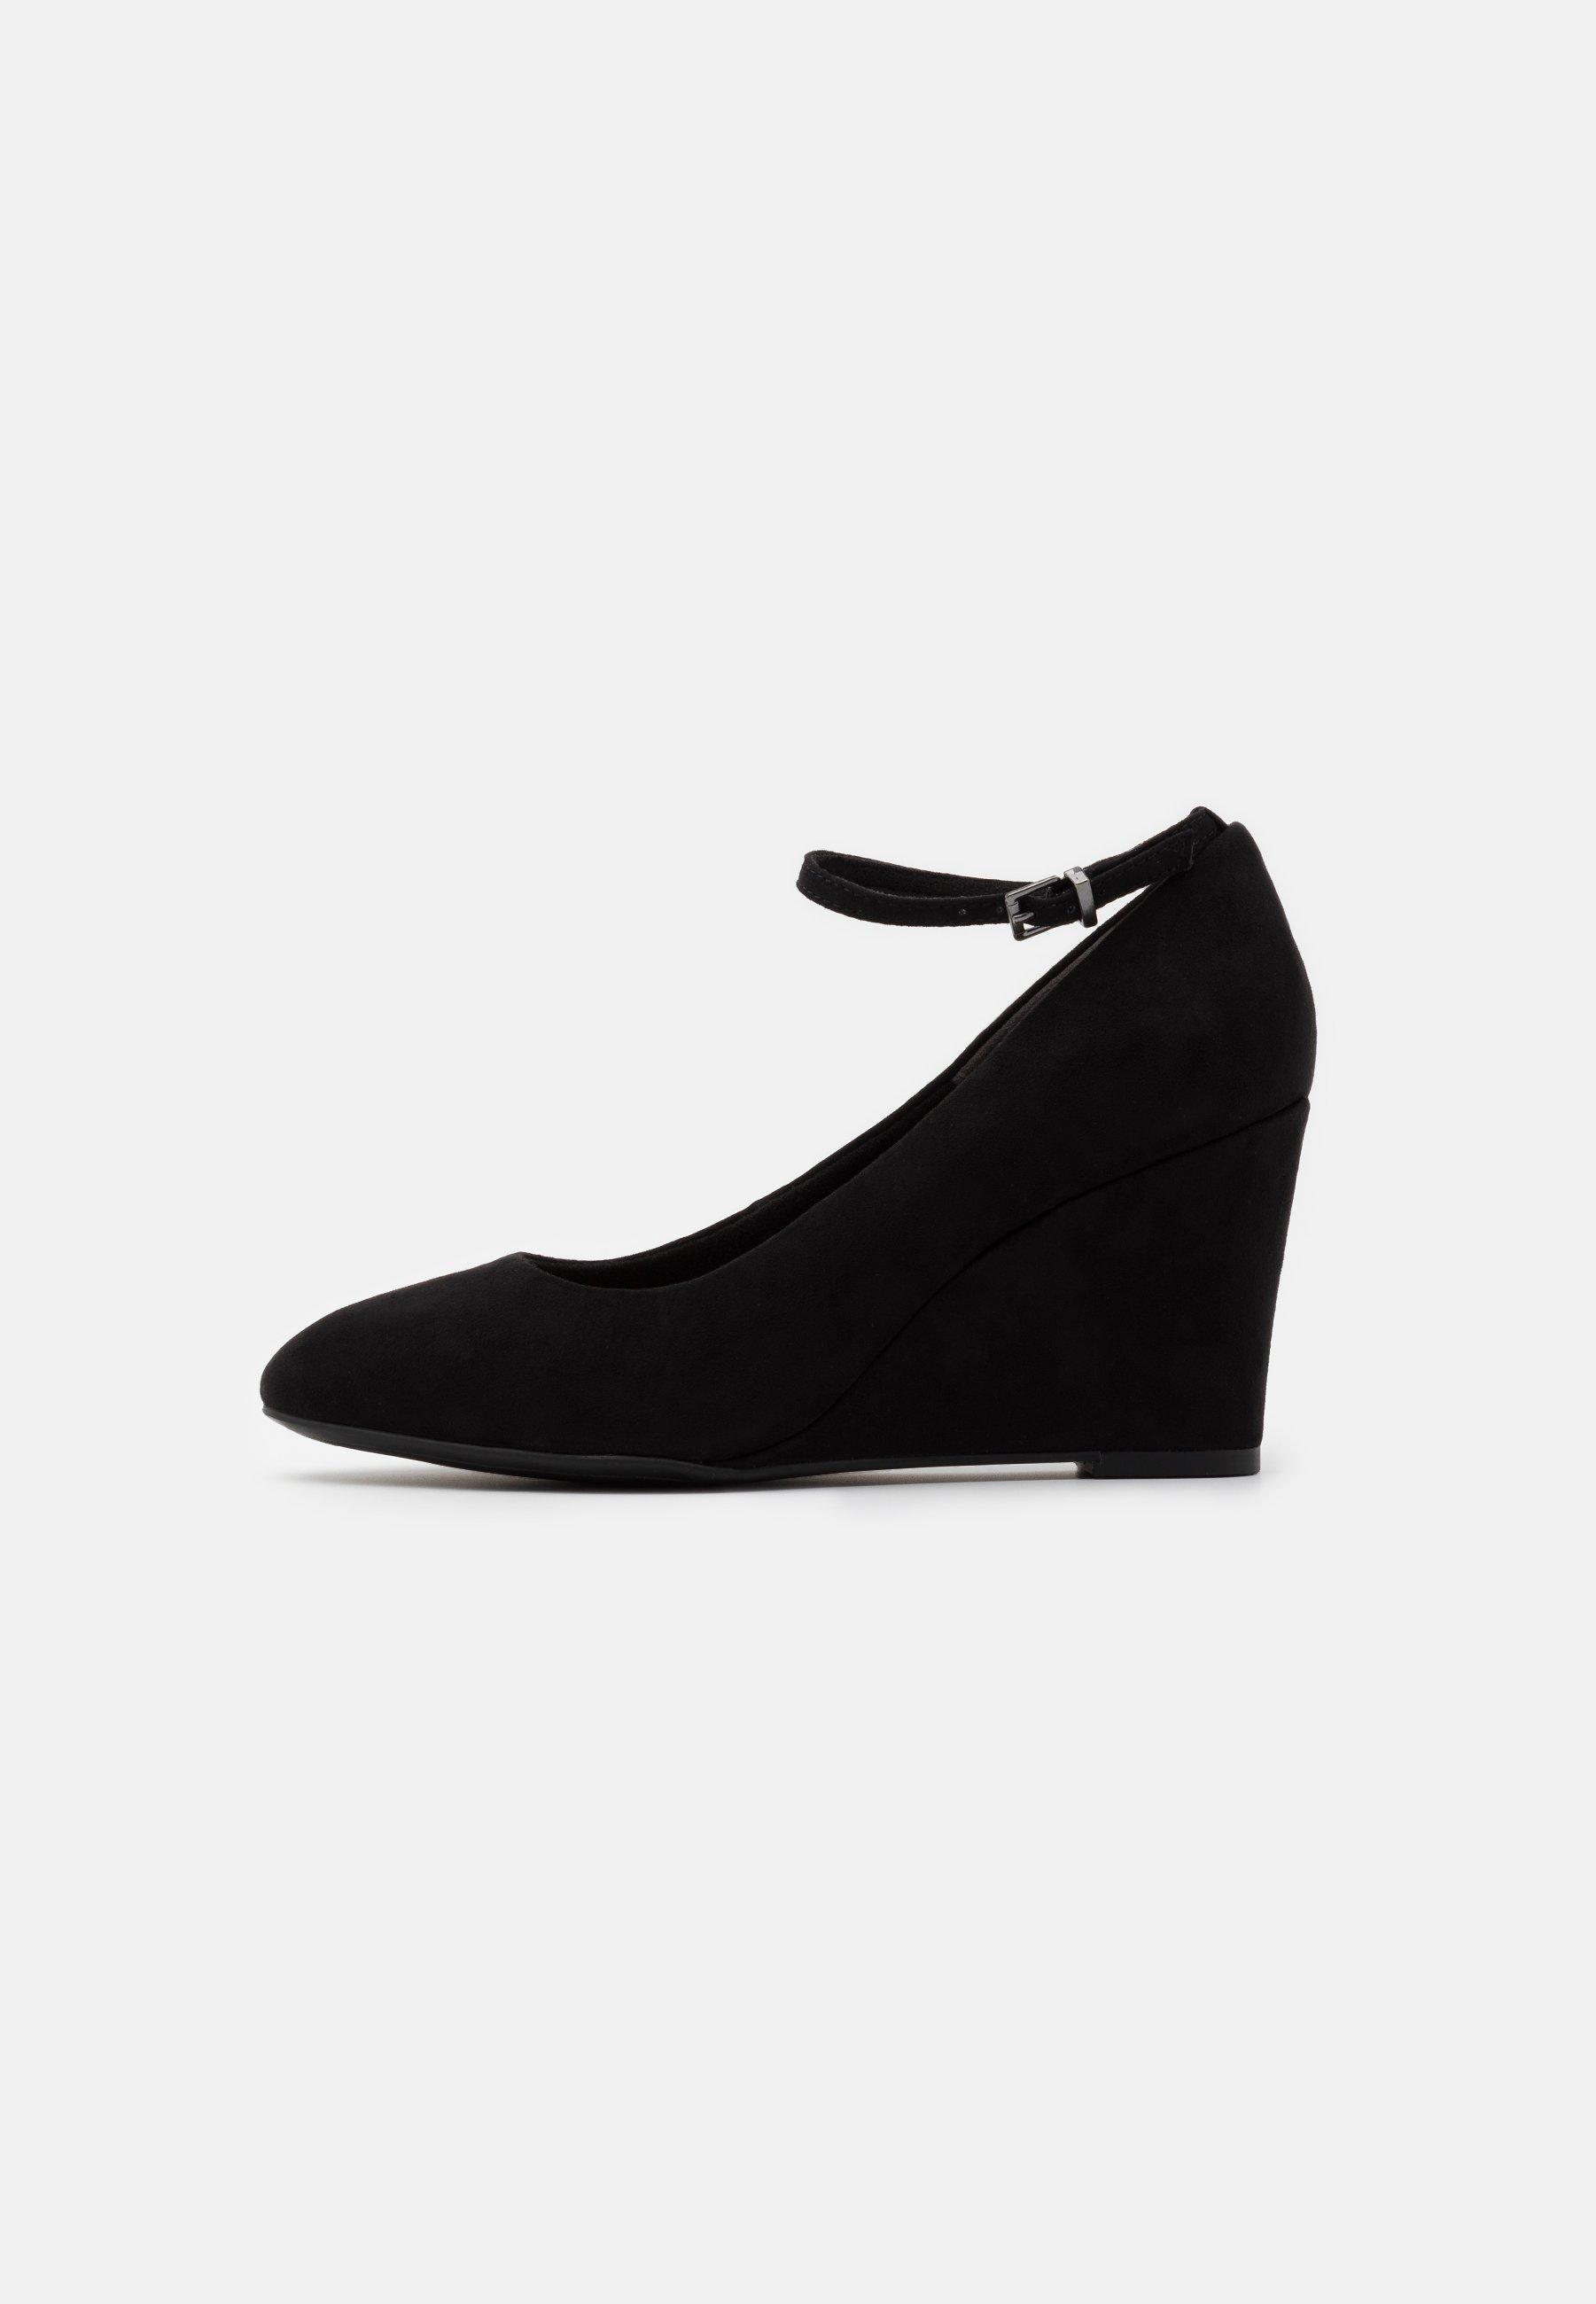 Gabor Peep Toe lav kilehæl Court sko | Fruugo NO